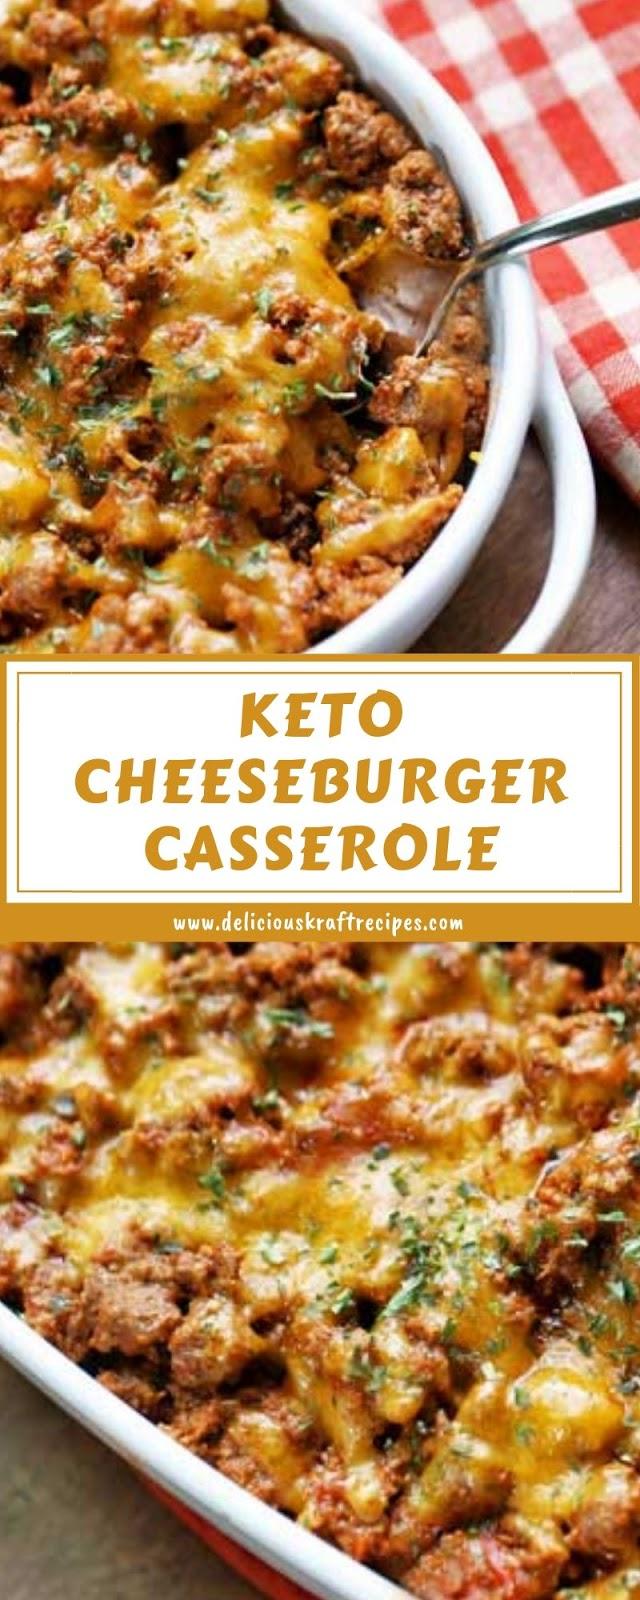 KETO CHEESEBURGER CASSEROLE